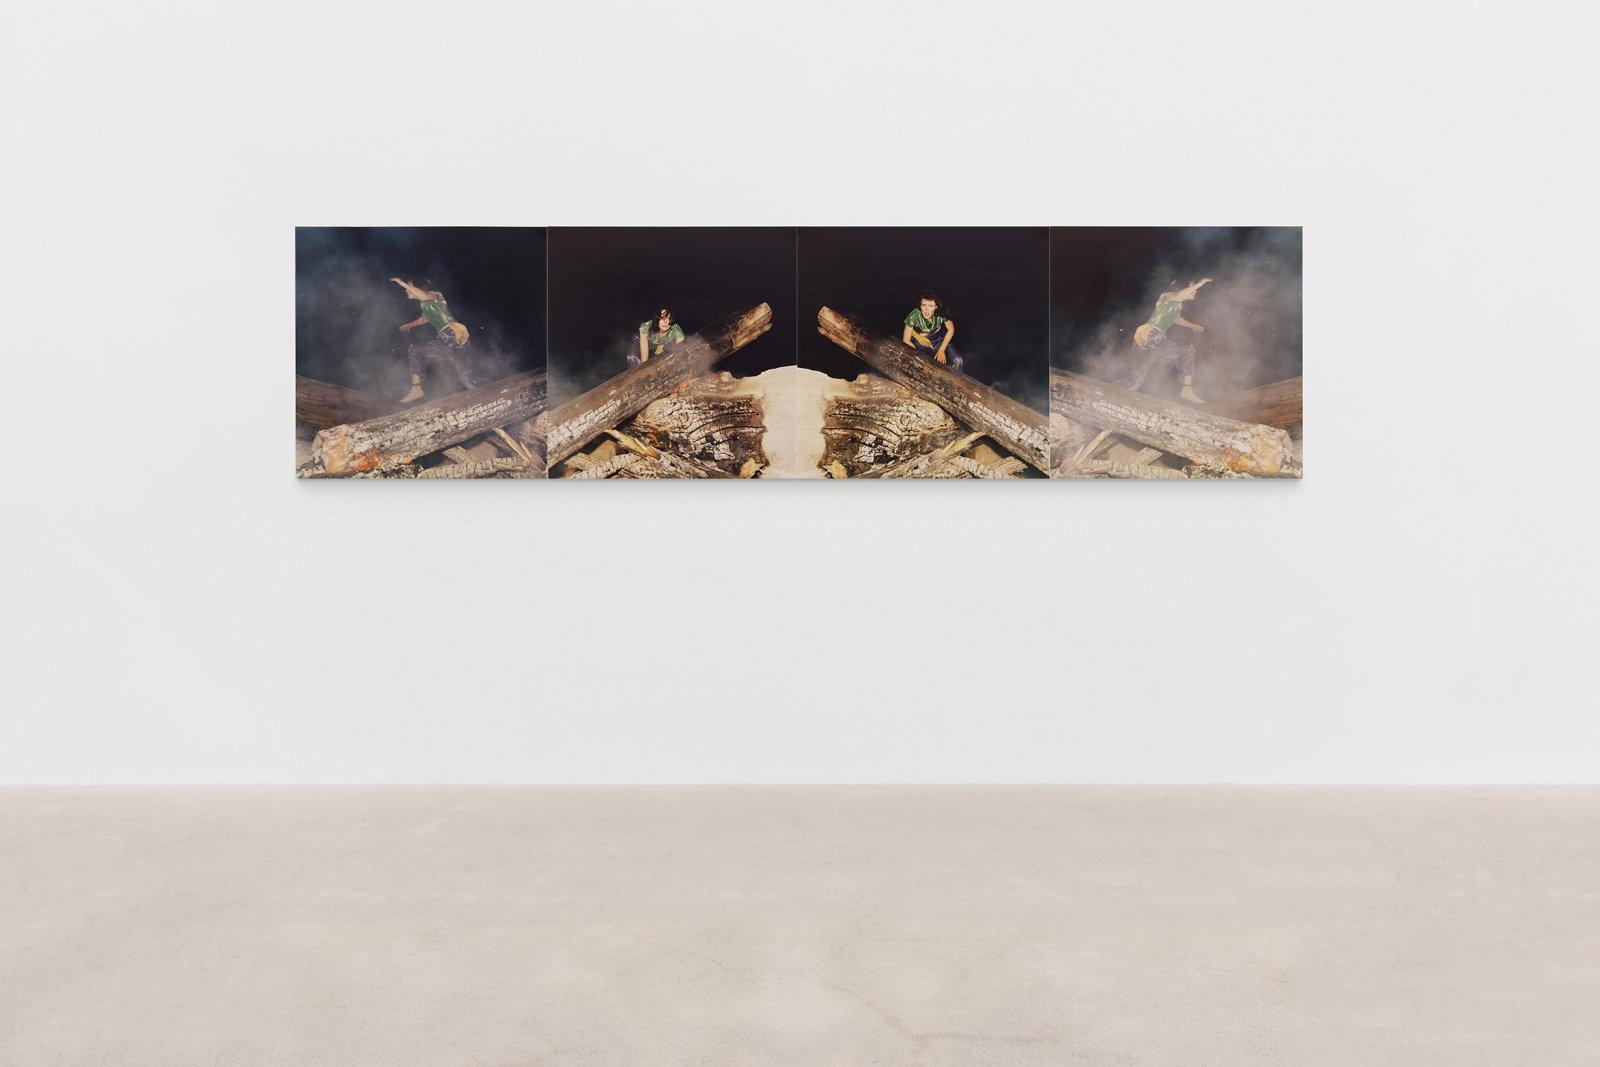 Ian Wallace, Hypnerotomachia (the Fire), 1977, 4 c-prints, 29 x 116 in. (74 x 295 cm)